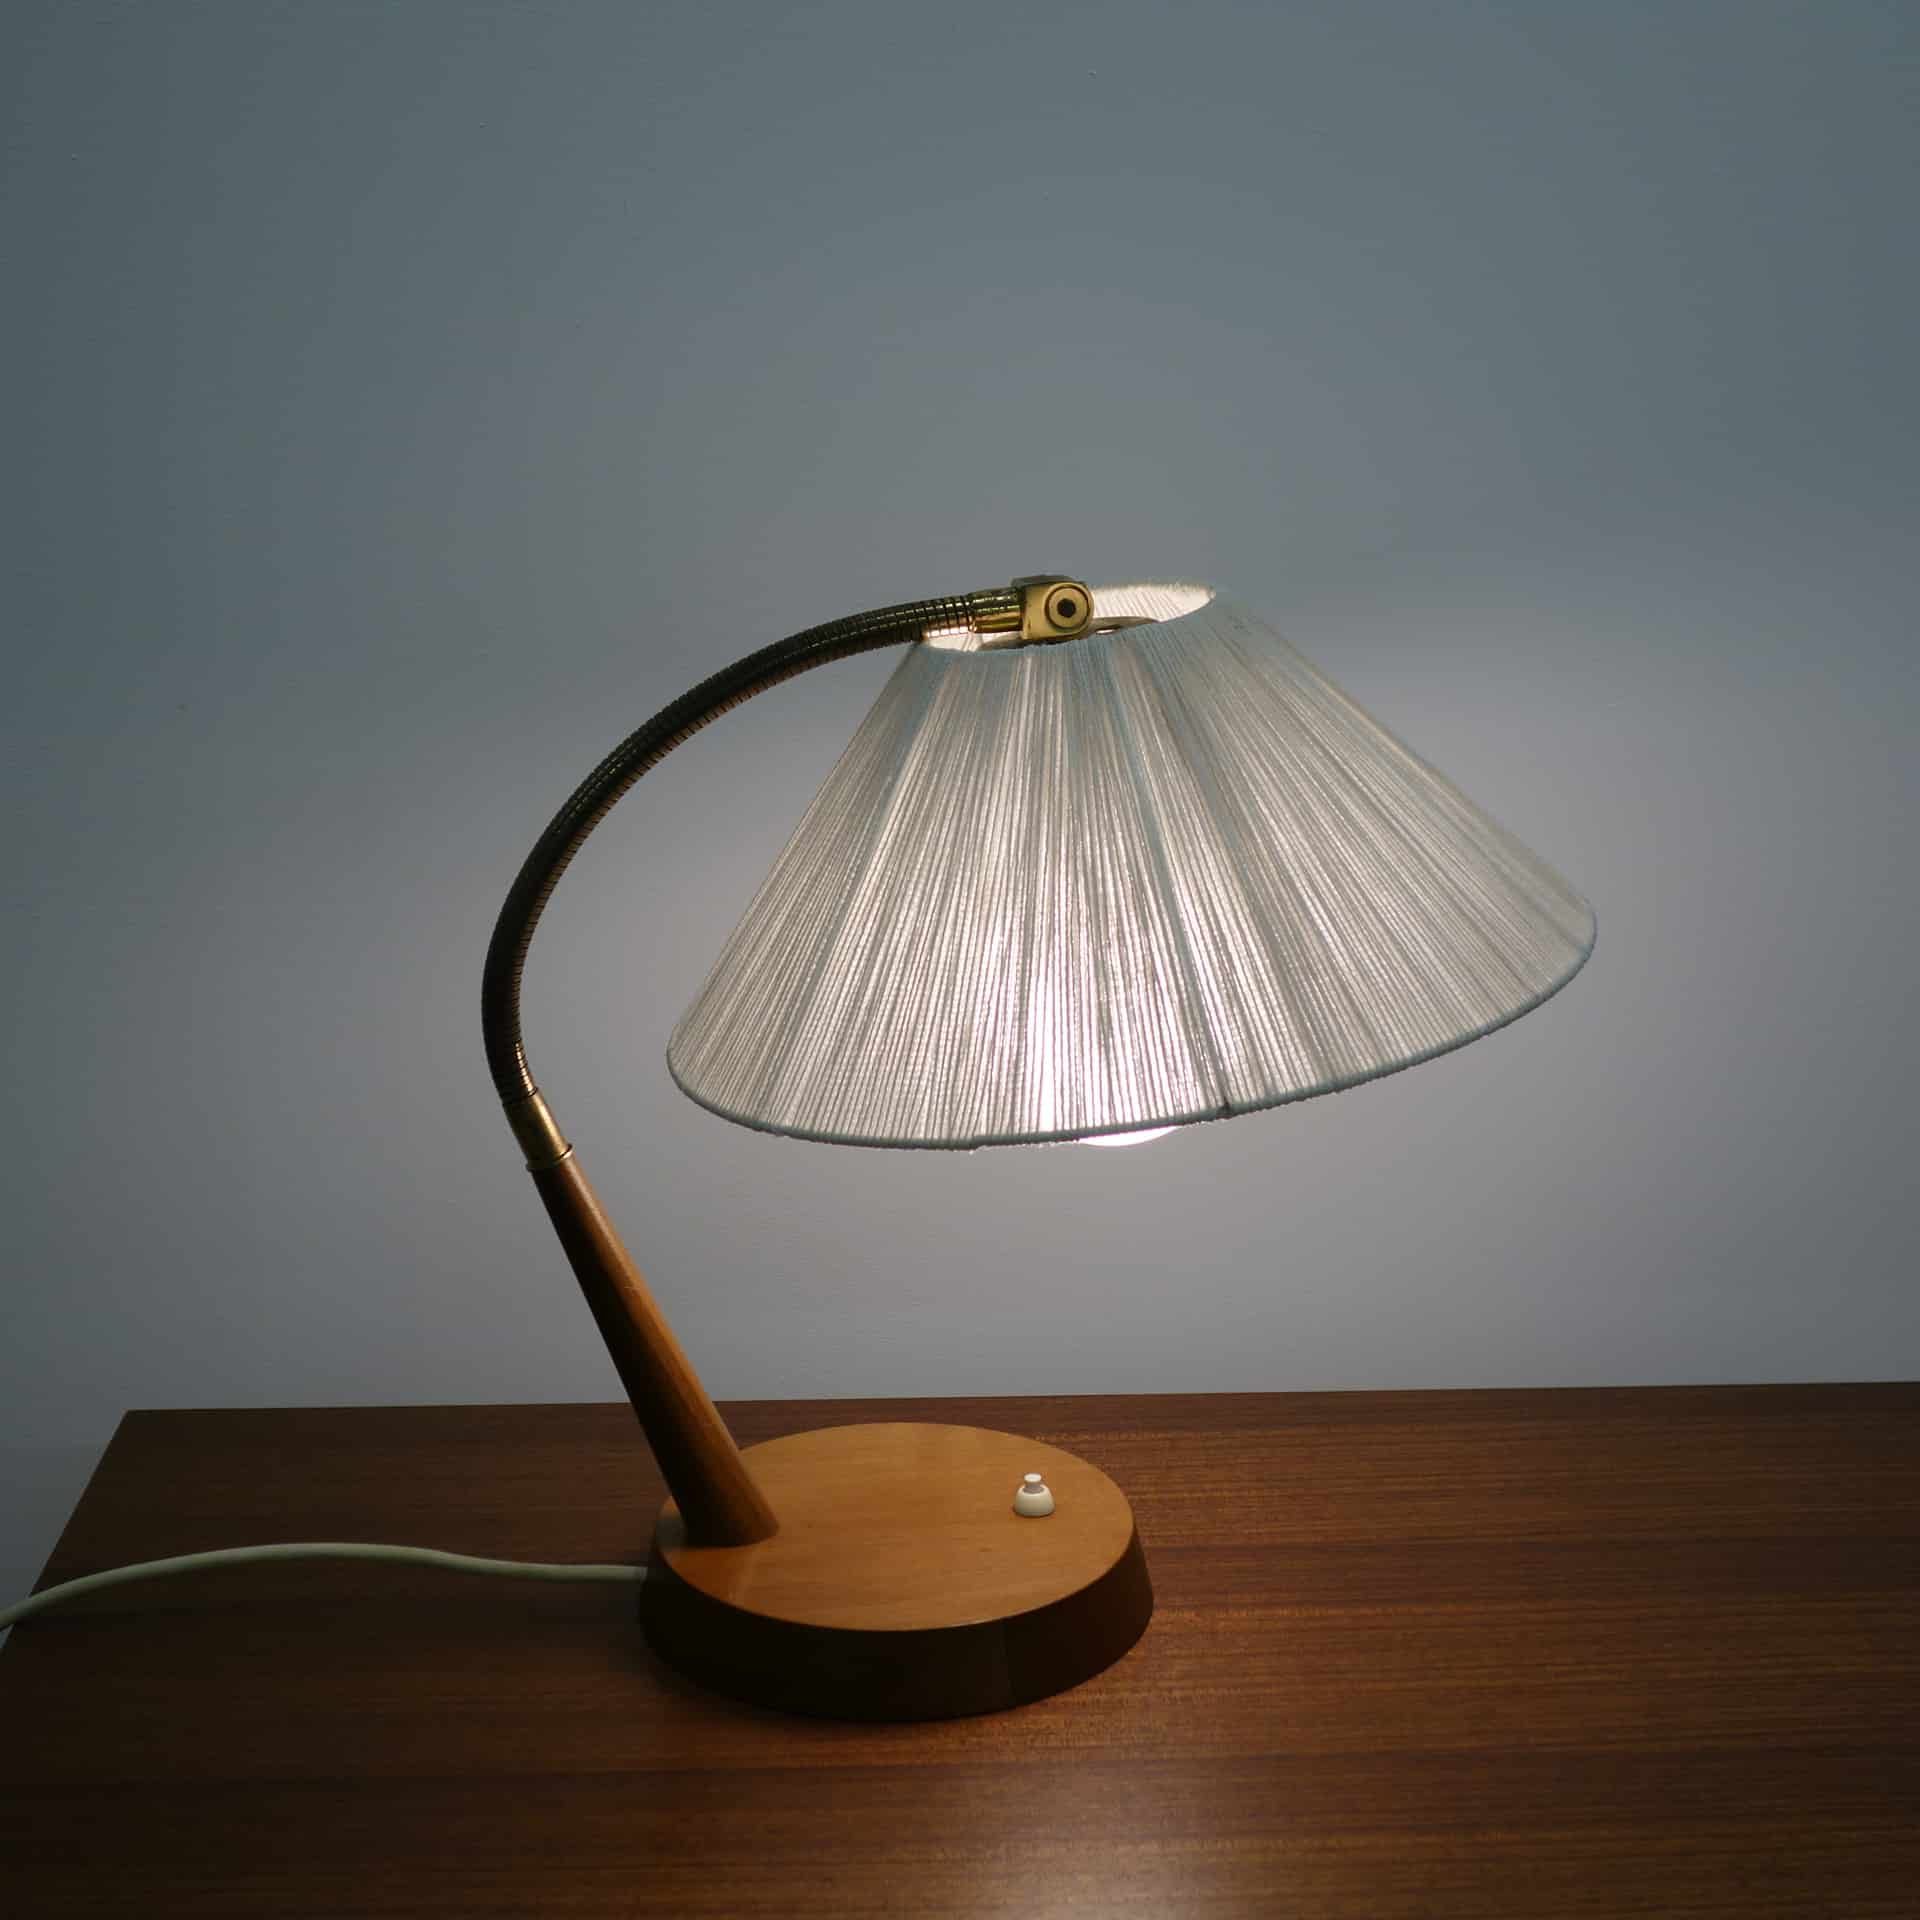 1960s teak desk lamp by Temde Leuchten